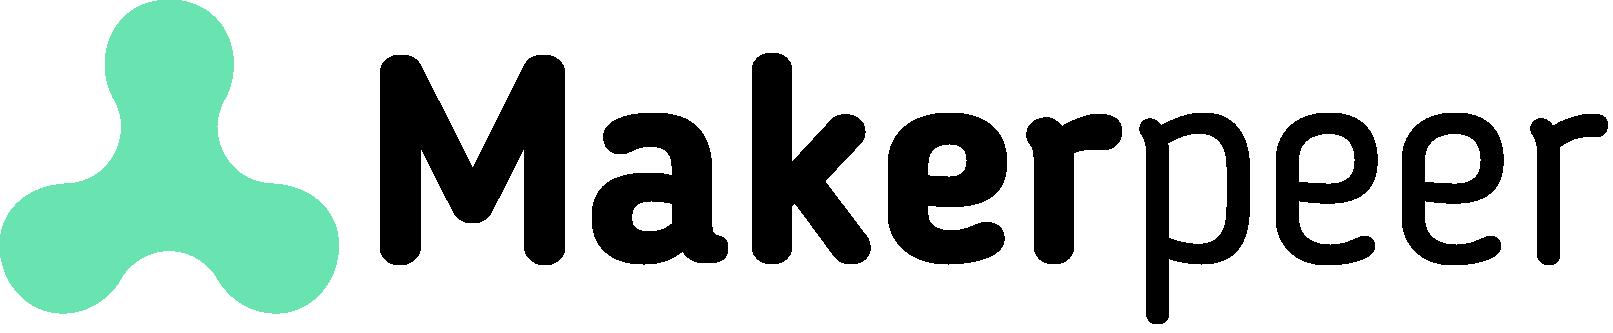 Makerpeer logo